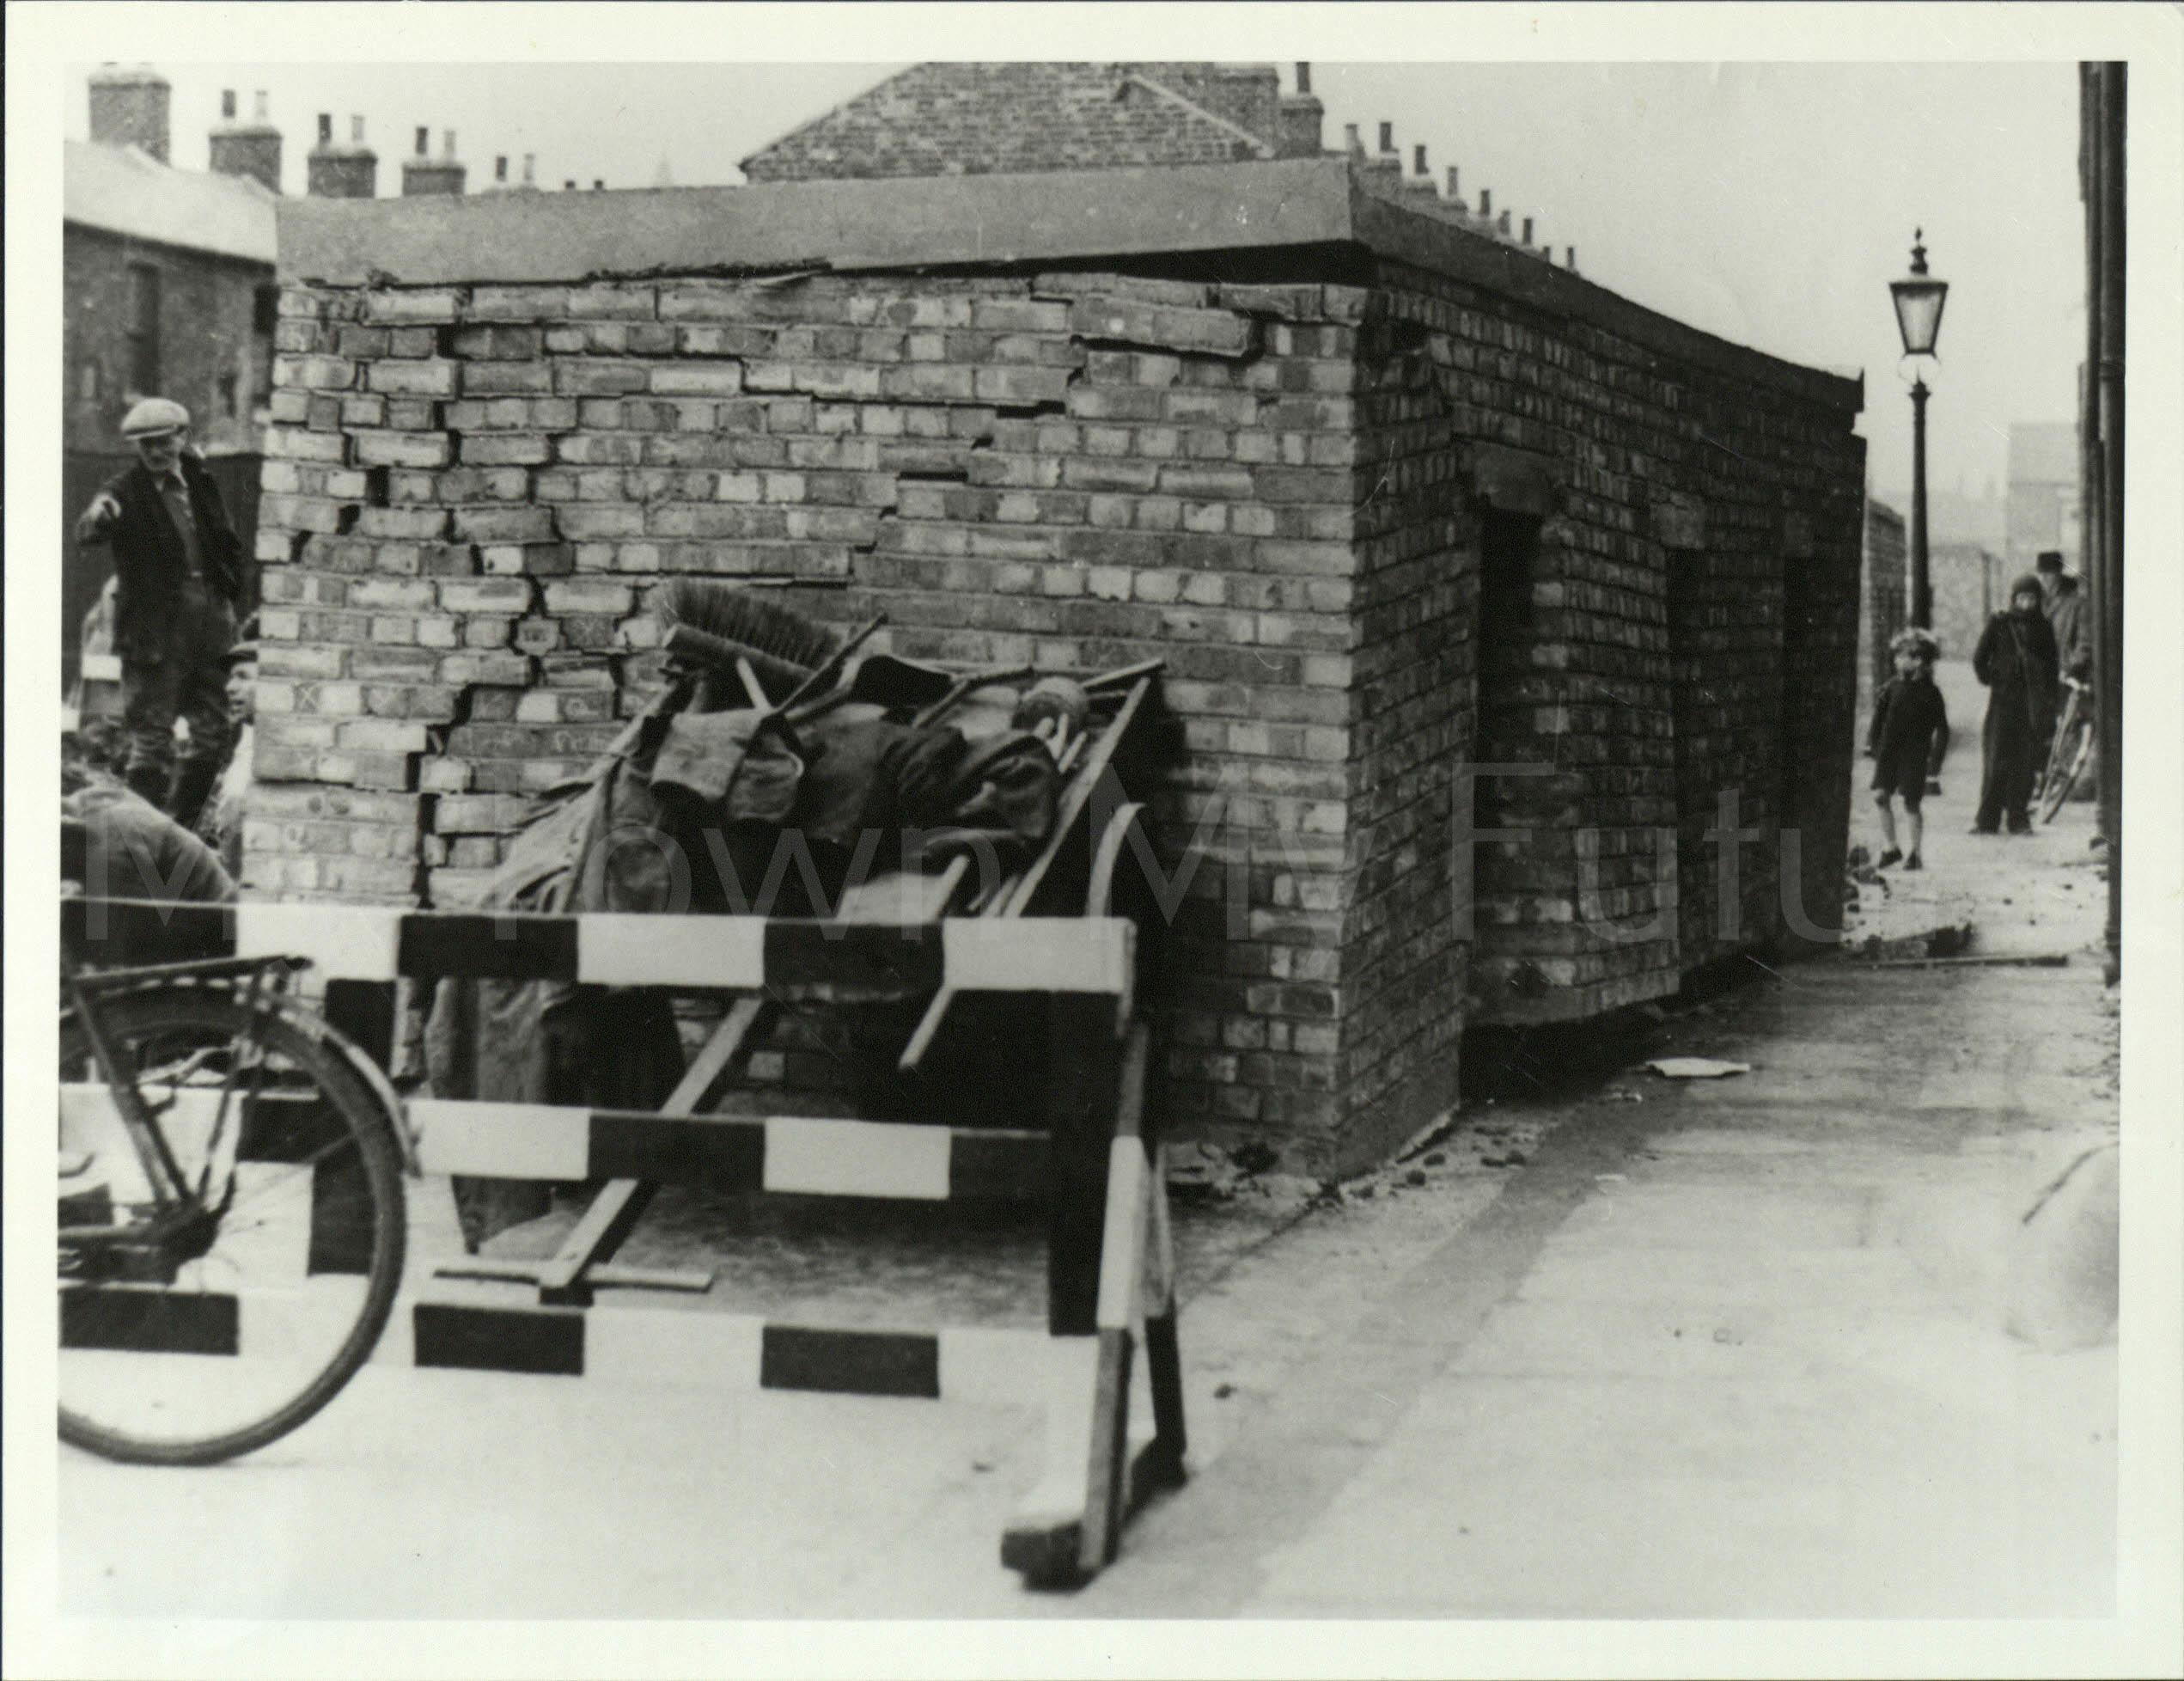 Brick Surface Shelters